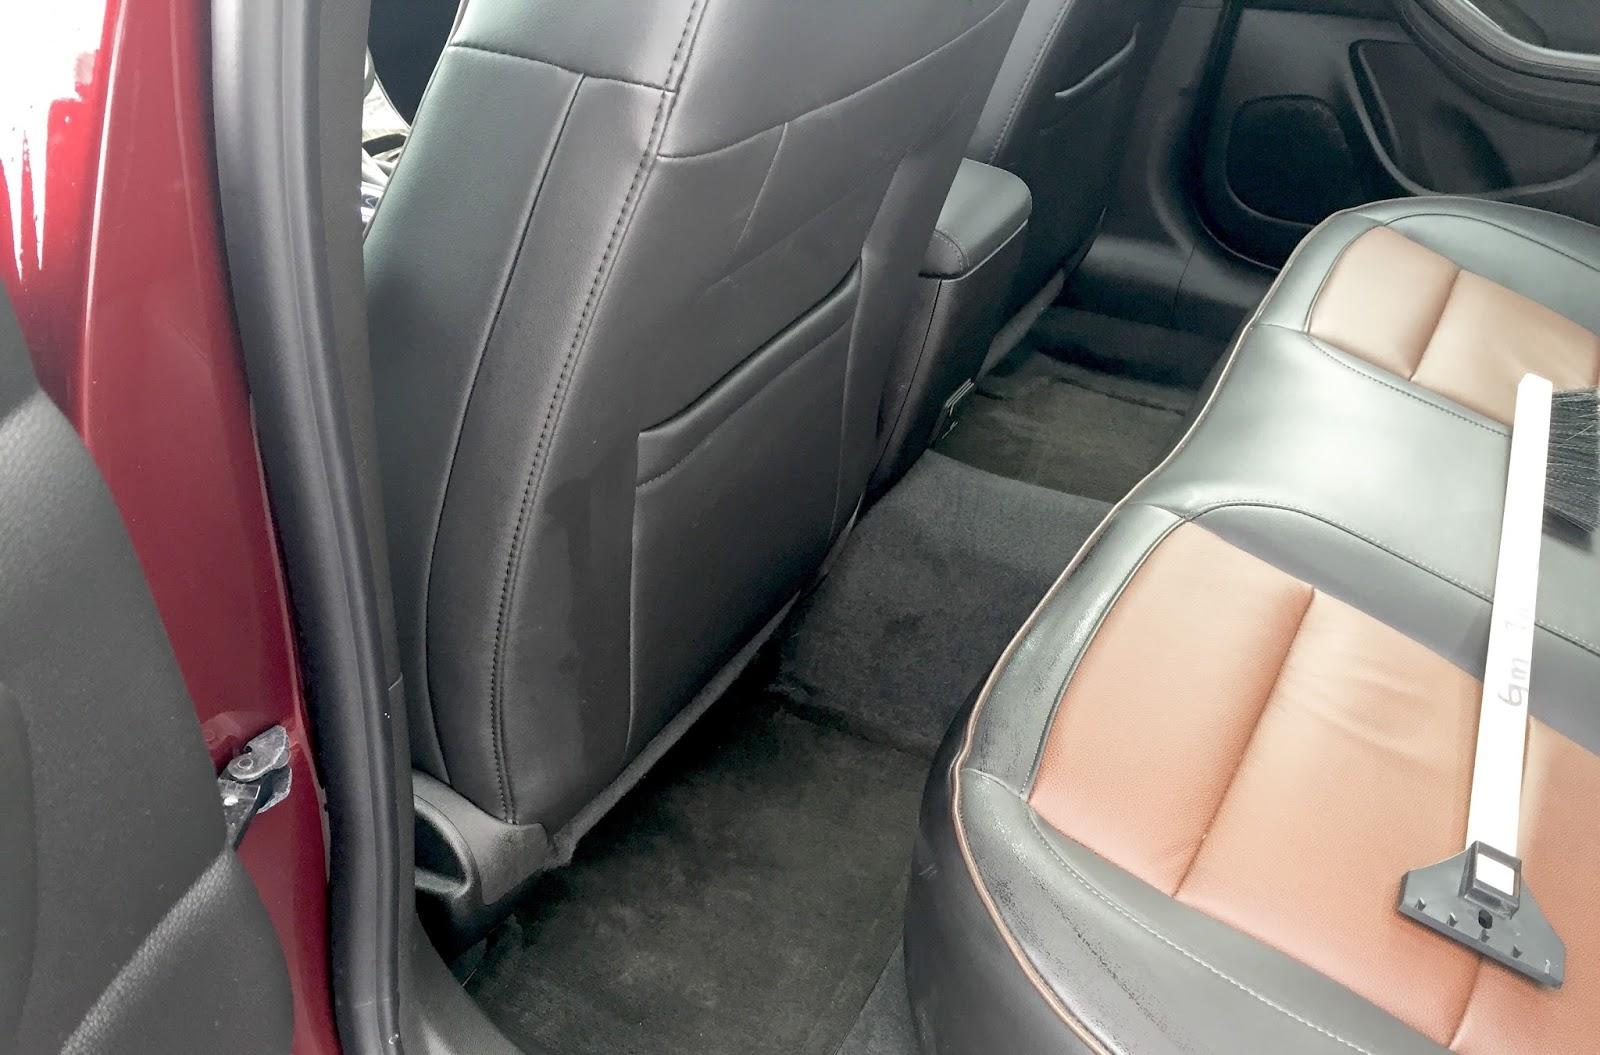 2015 Chevrolet Malibu LTZ back seat